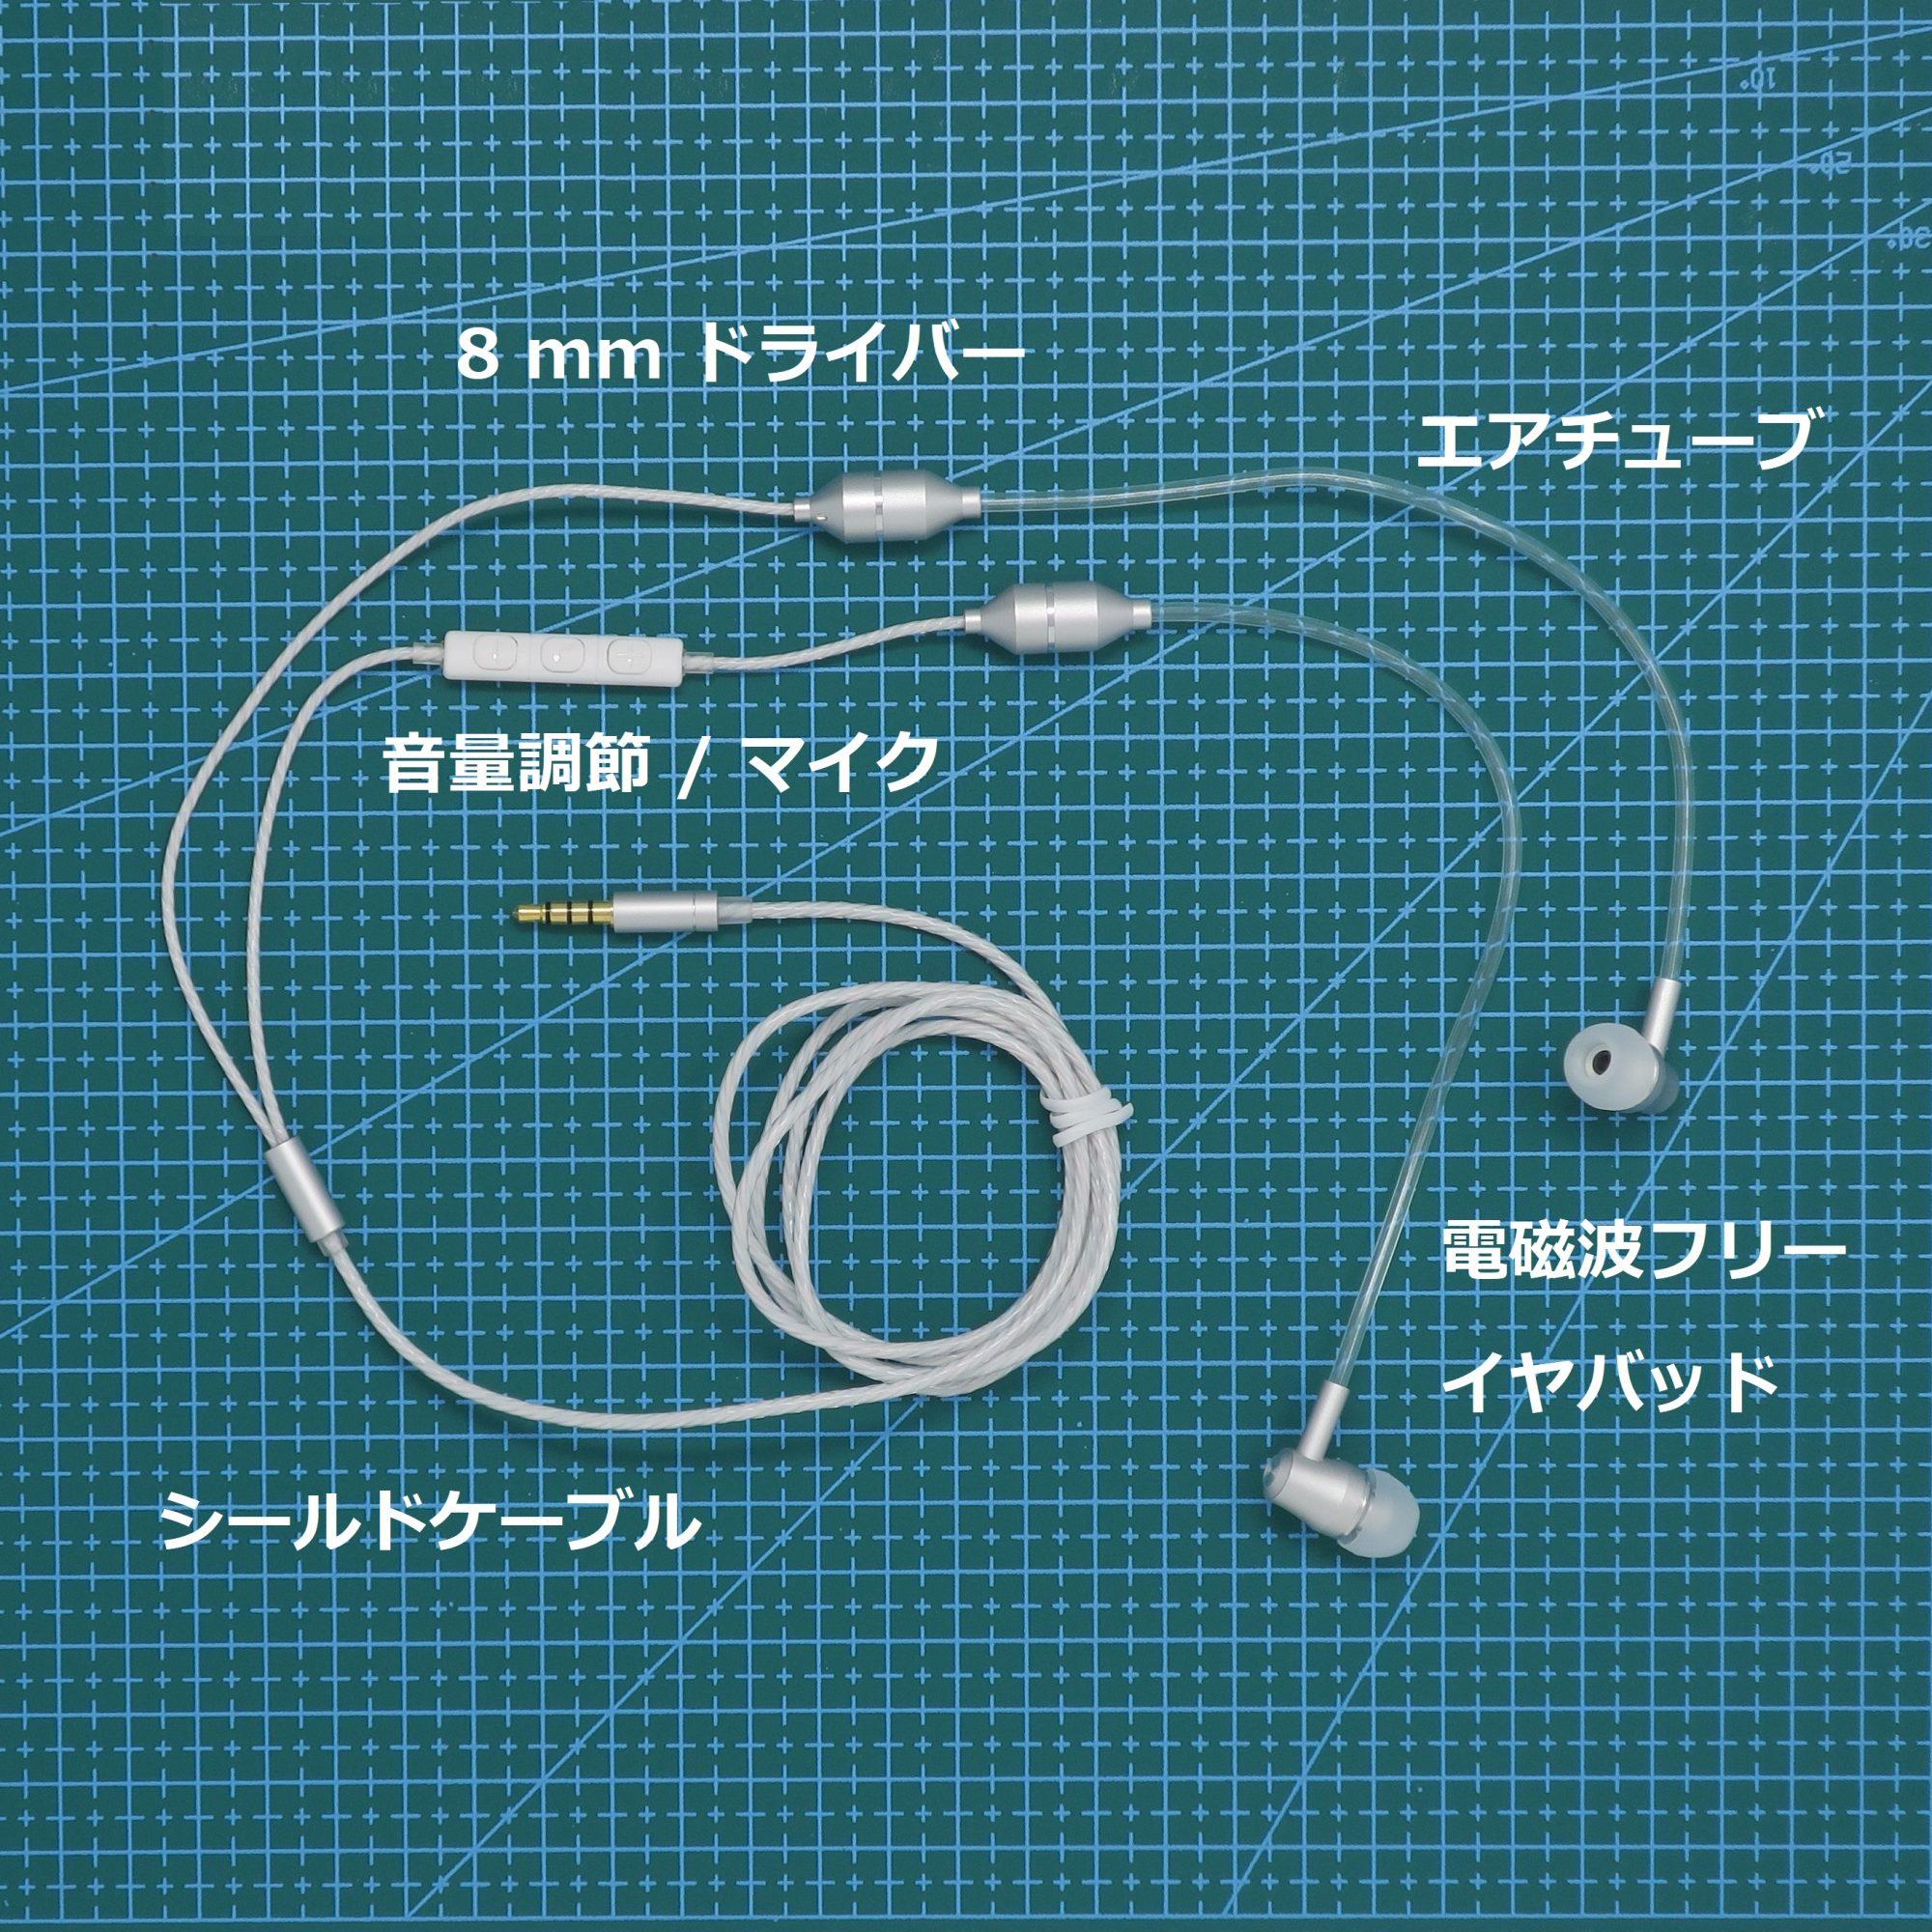 NoiseIsolationJapan